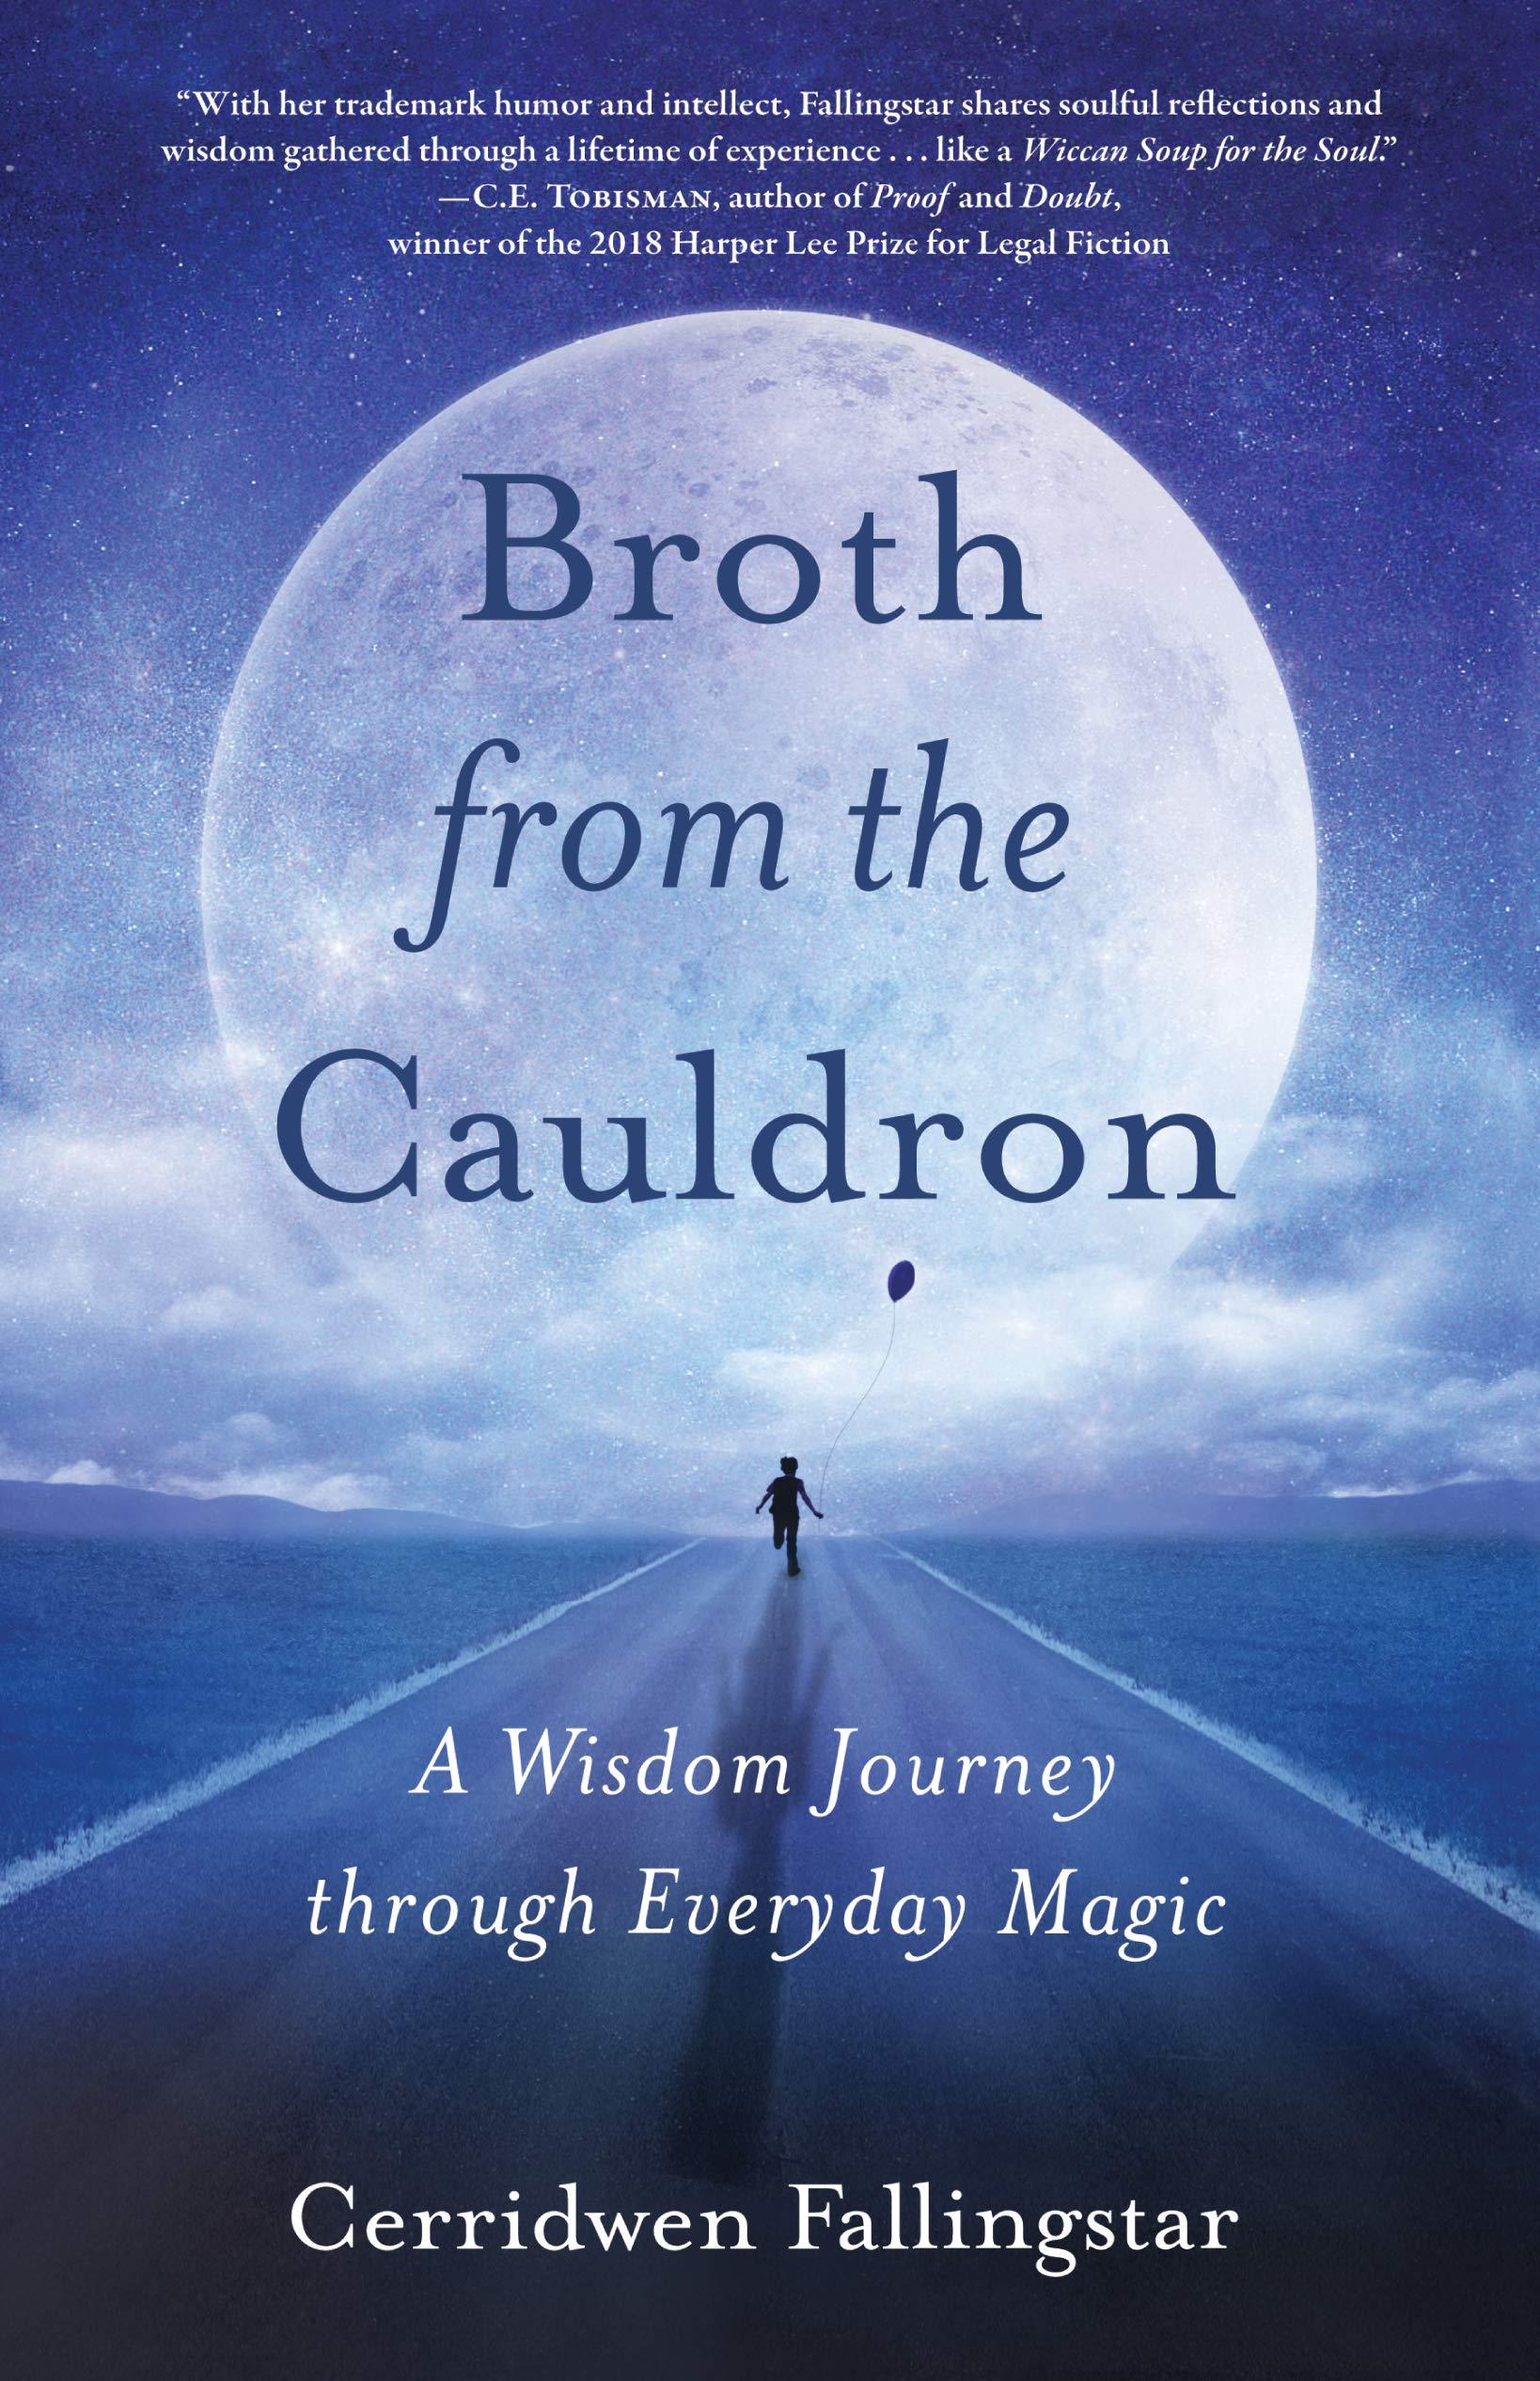 Broth from the Cauldron: A Wisdom Journey through Everyday Magic: Fallingstar, Cerridwen: 9781631526992: Amazon.com: Books